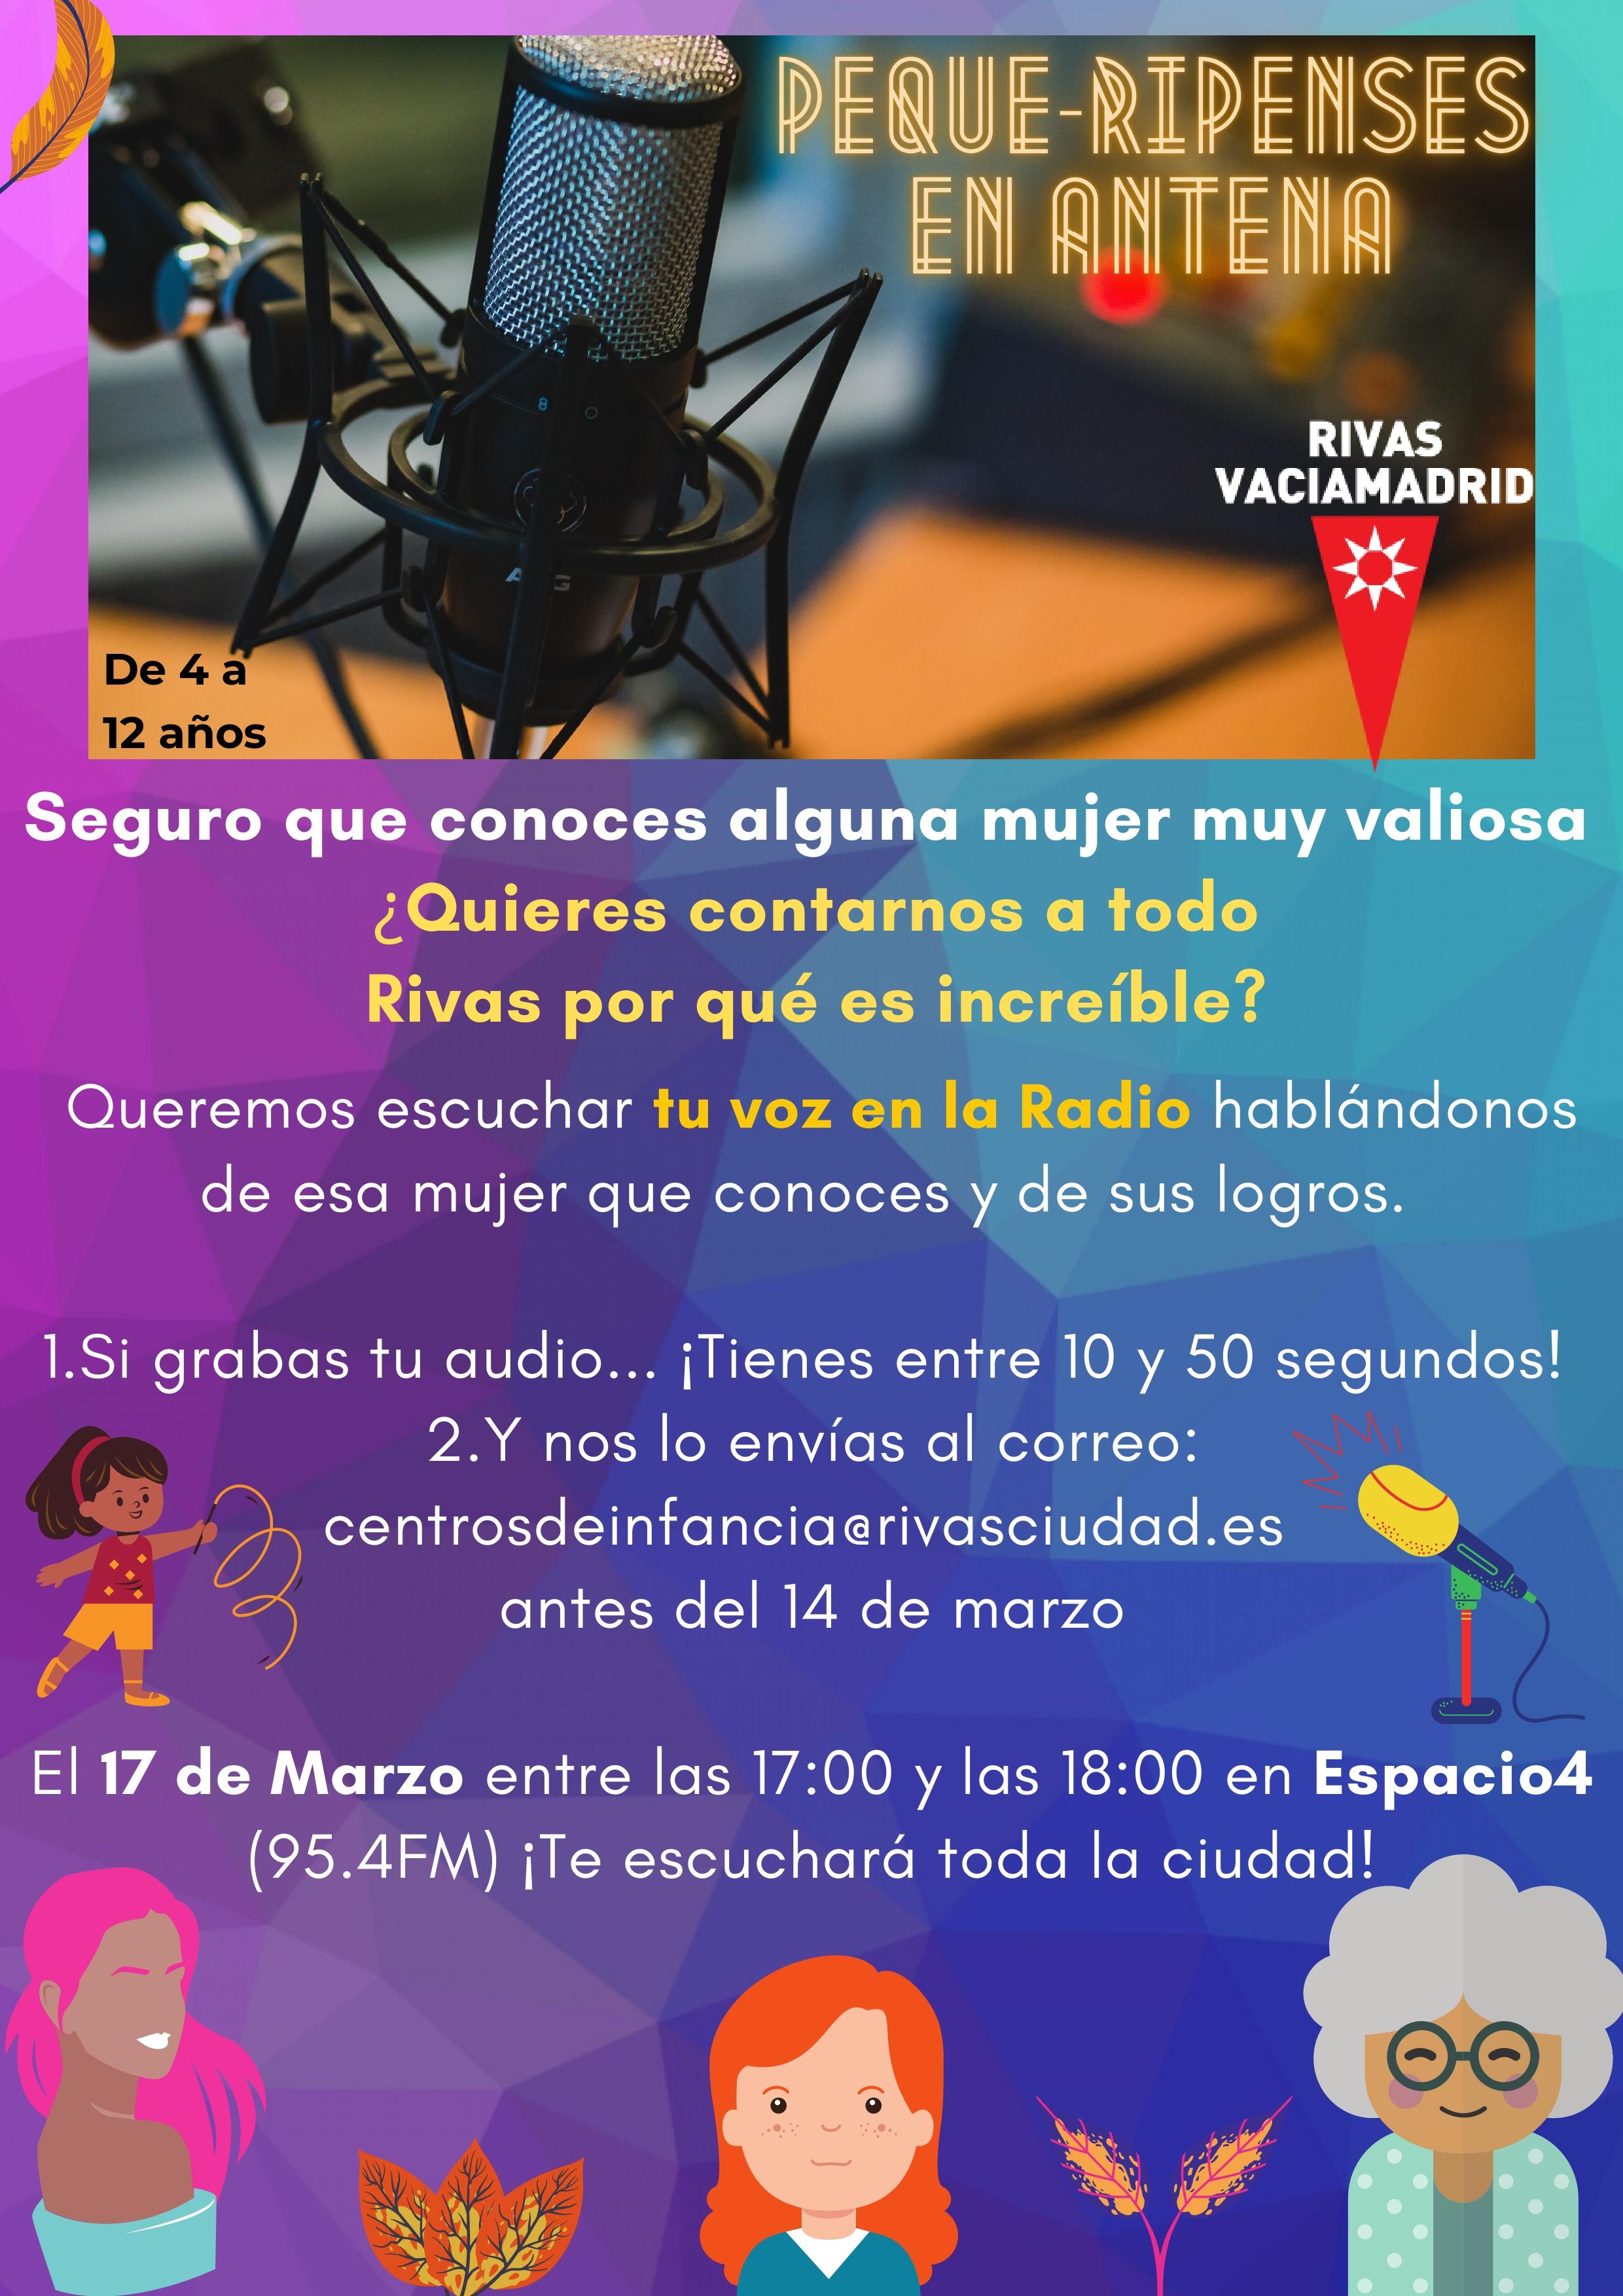 Peque-ripenses en antena - Participación infantil en programa de radio